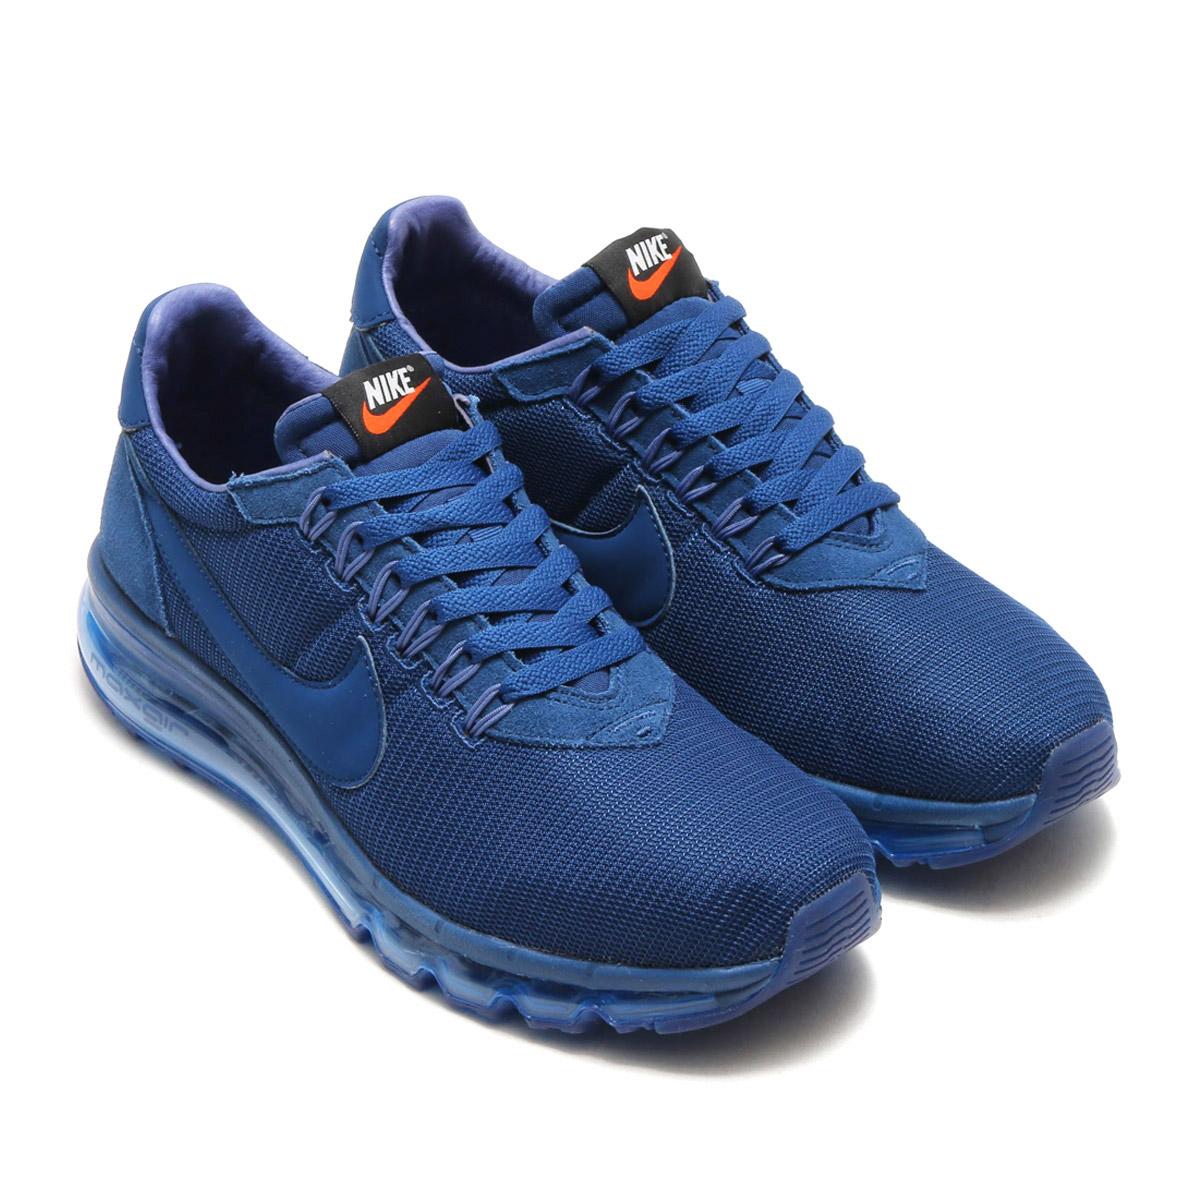 NIKE AIR MAX LD-ZERO (ナイキ エア マックス LD-ゼロ) COASTAL BLUE/COASTAL BLUE-BLUE MOON【メンズ スニーカー】17SU-I